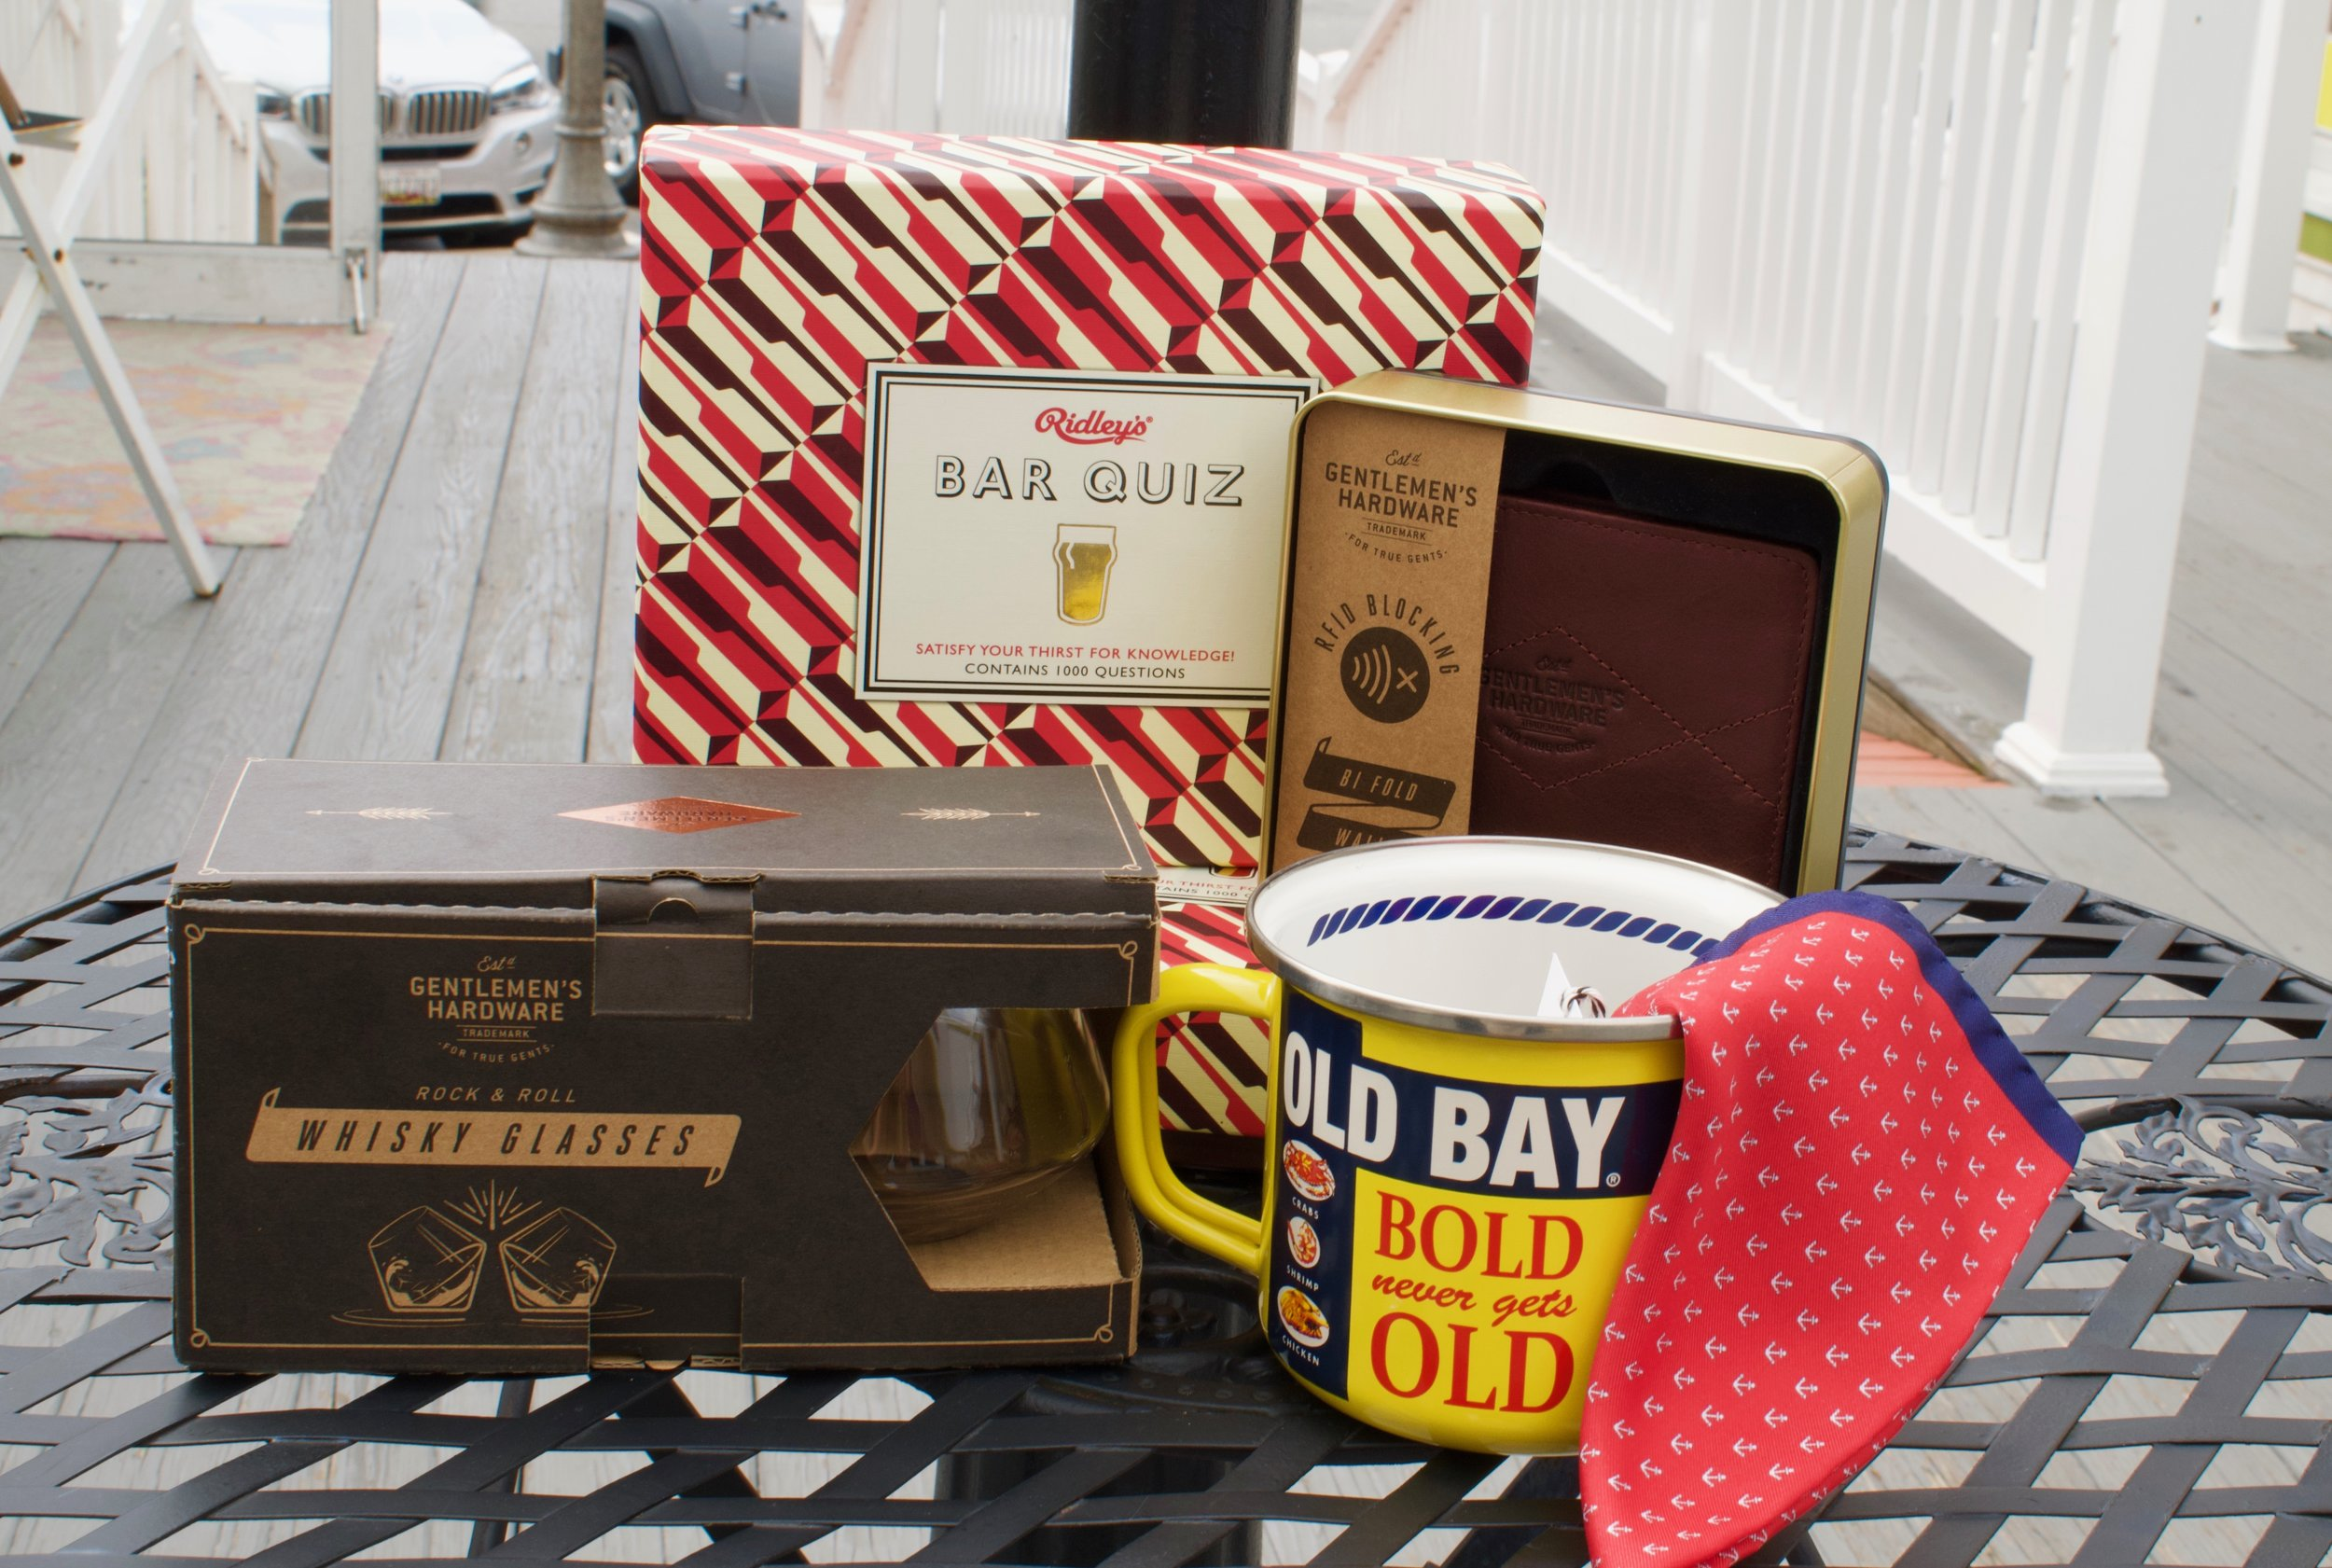 3. Ridley's Bar Quiz, Gentlemen's Hardware Leather Wallet, Gentlemen's Hardware Whisky Glasses, Old Bay Grande Mug, 100% Italian Silk Pocket square